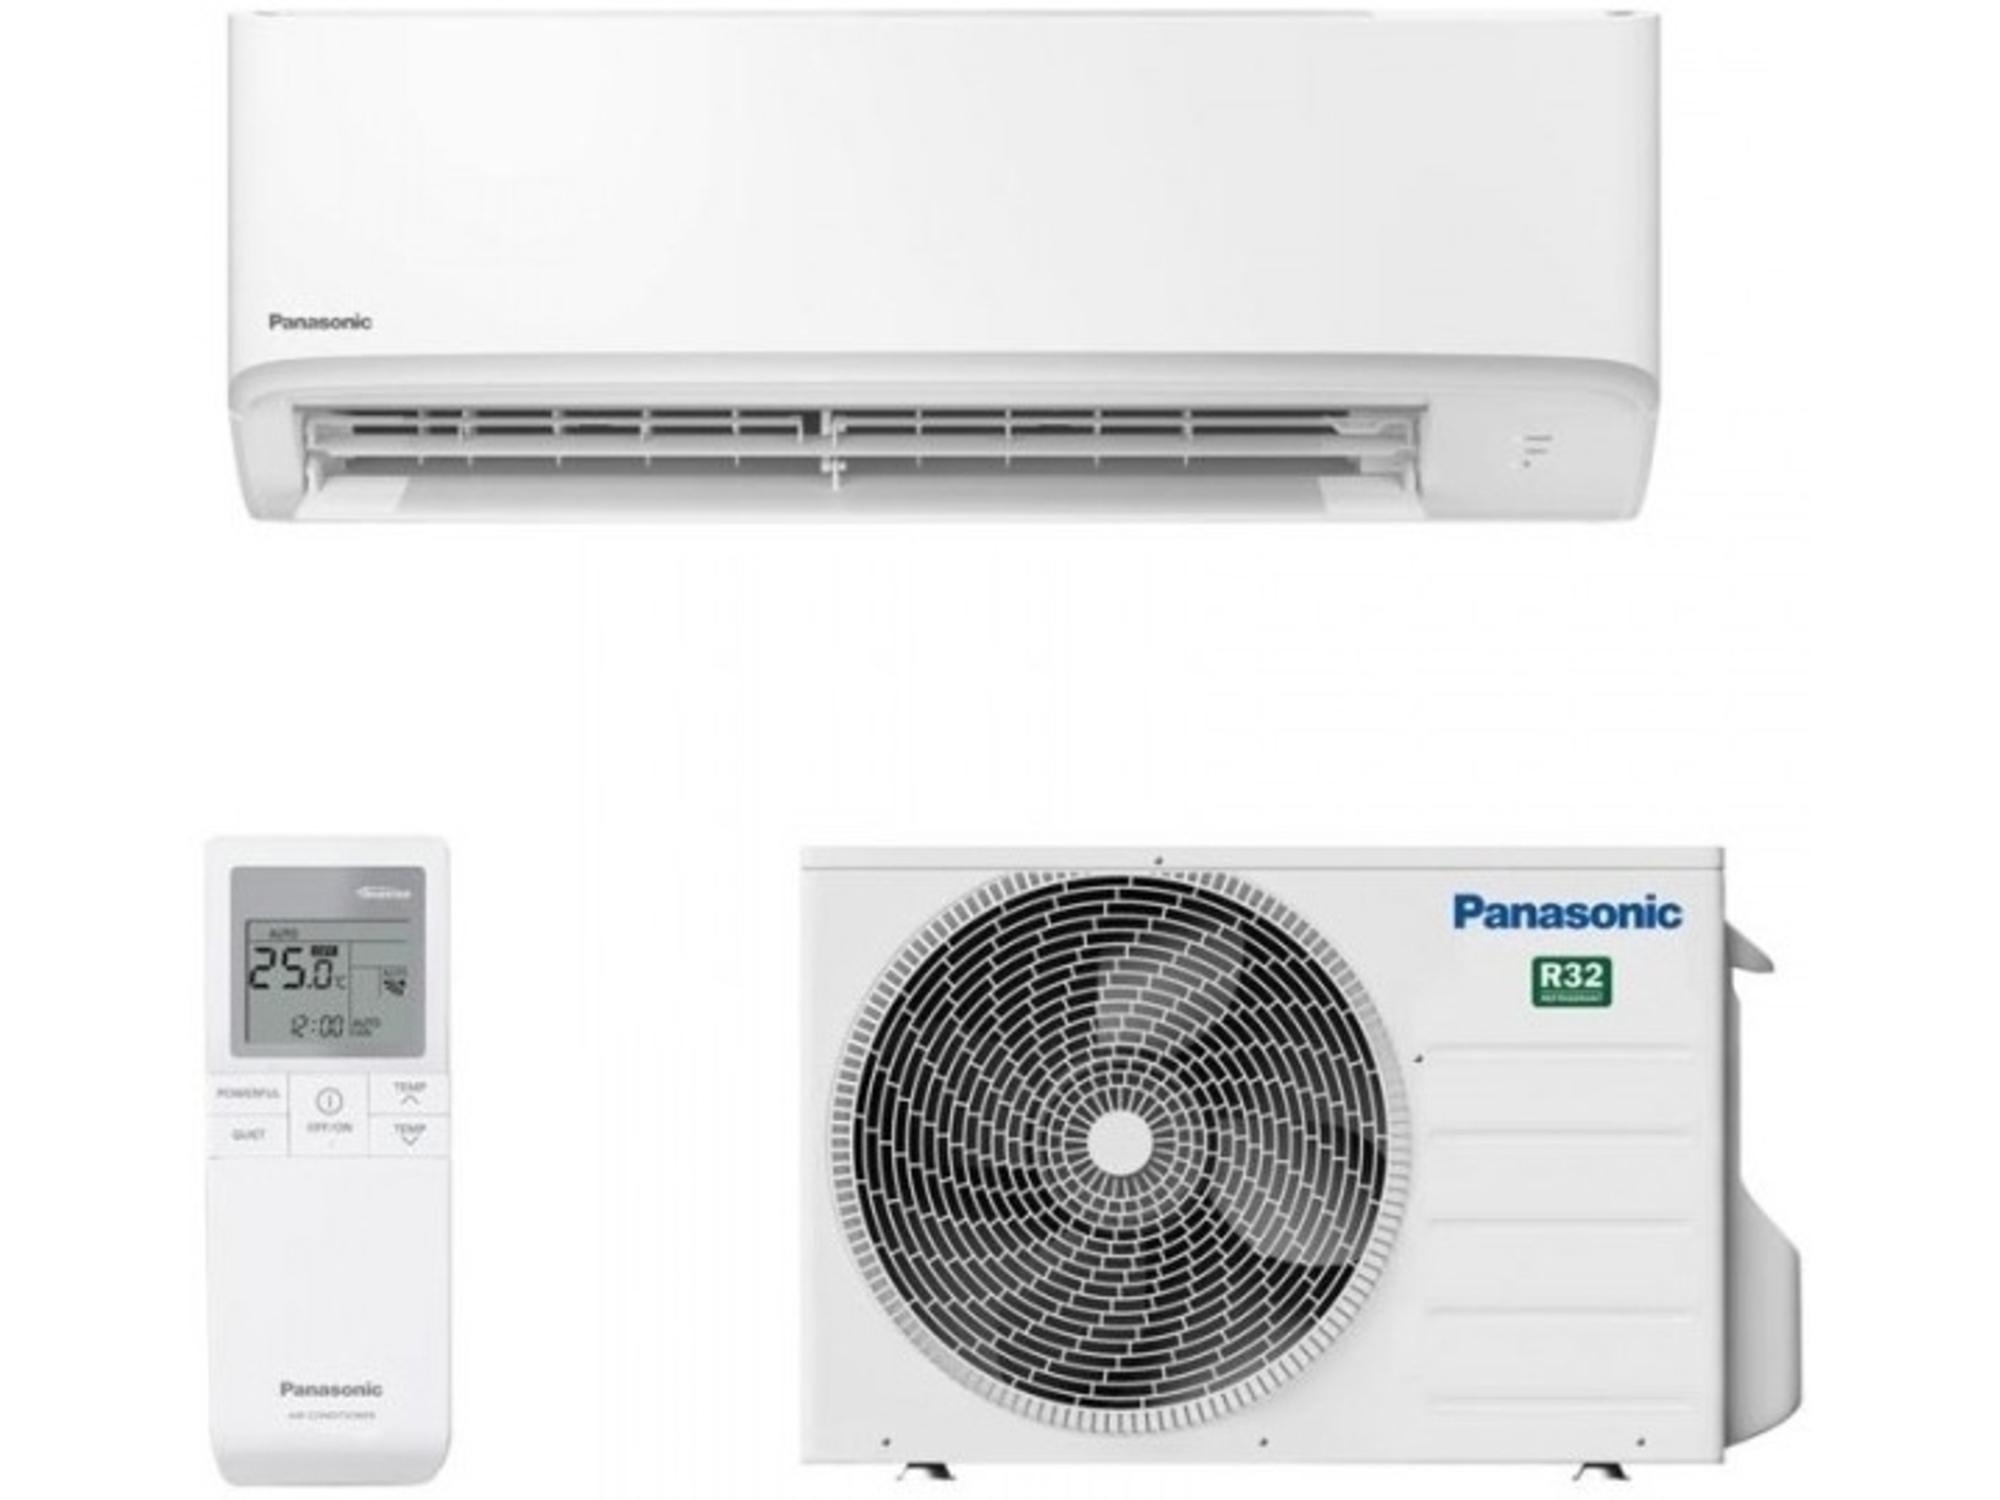 Panasonic Klimatska naprava z montažo COMPACT CS-TZ42WKE/CU-TZ42WKE - 4,2kW